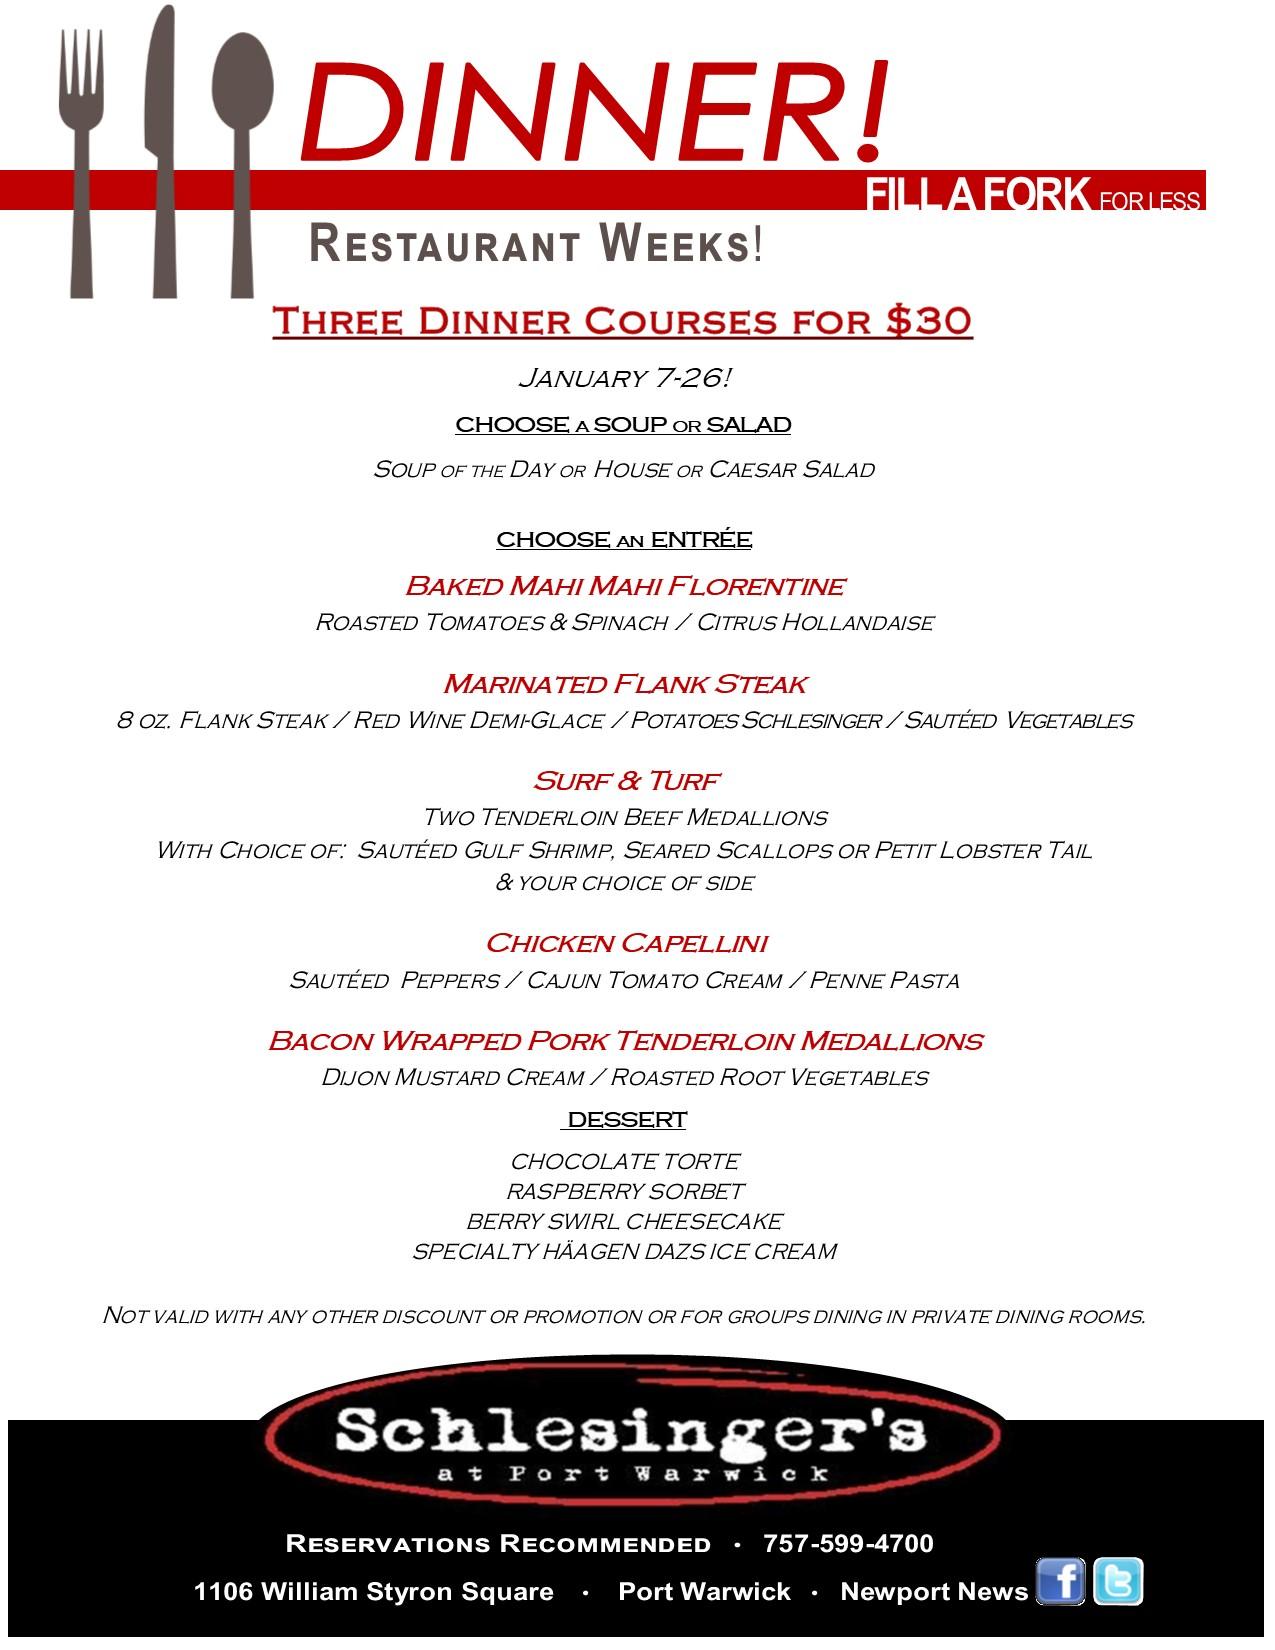 schles-email-dinner-rweek-2019